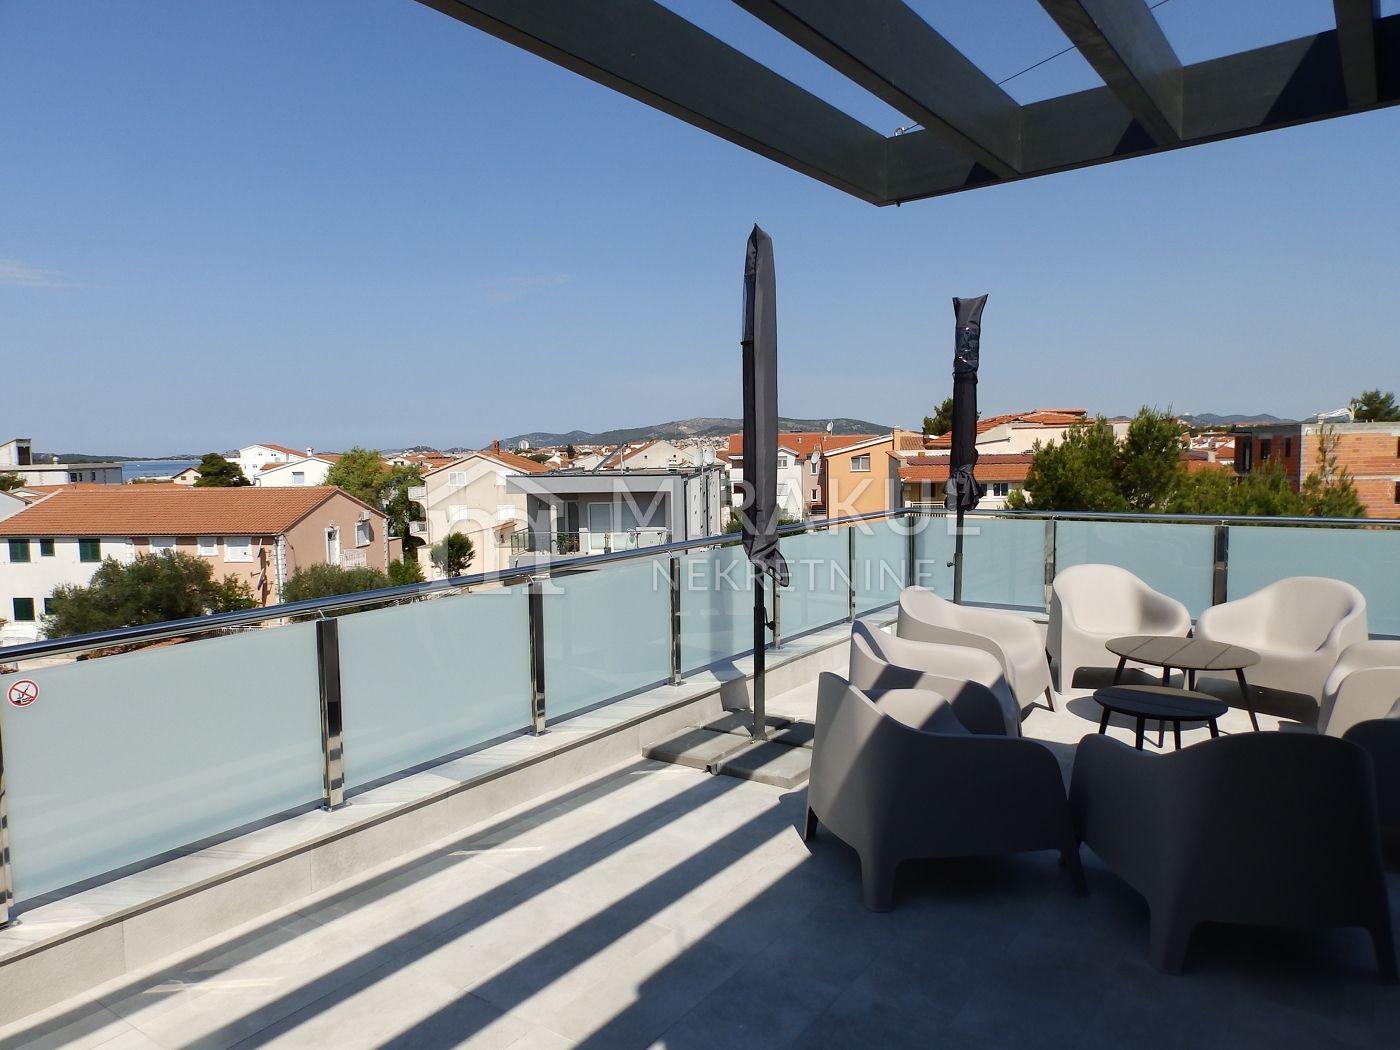 Properties Srima Croatia, Mirakul Real Estate agency, AS-751, Luxurious flat with a pool 3